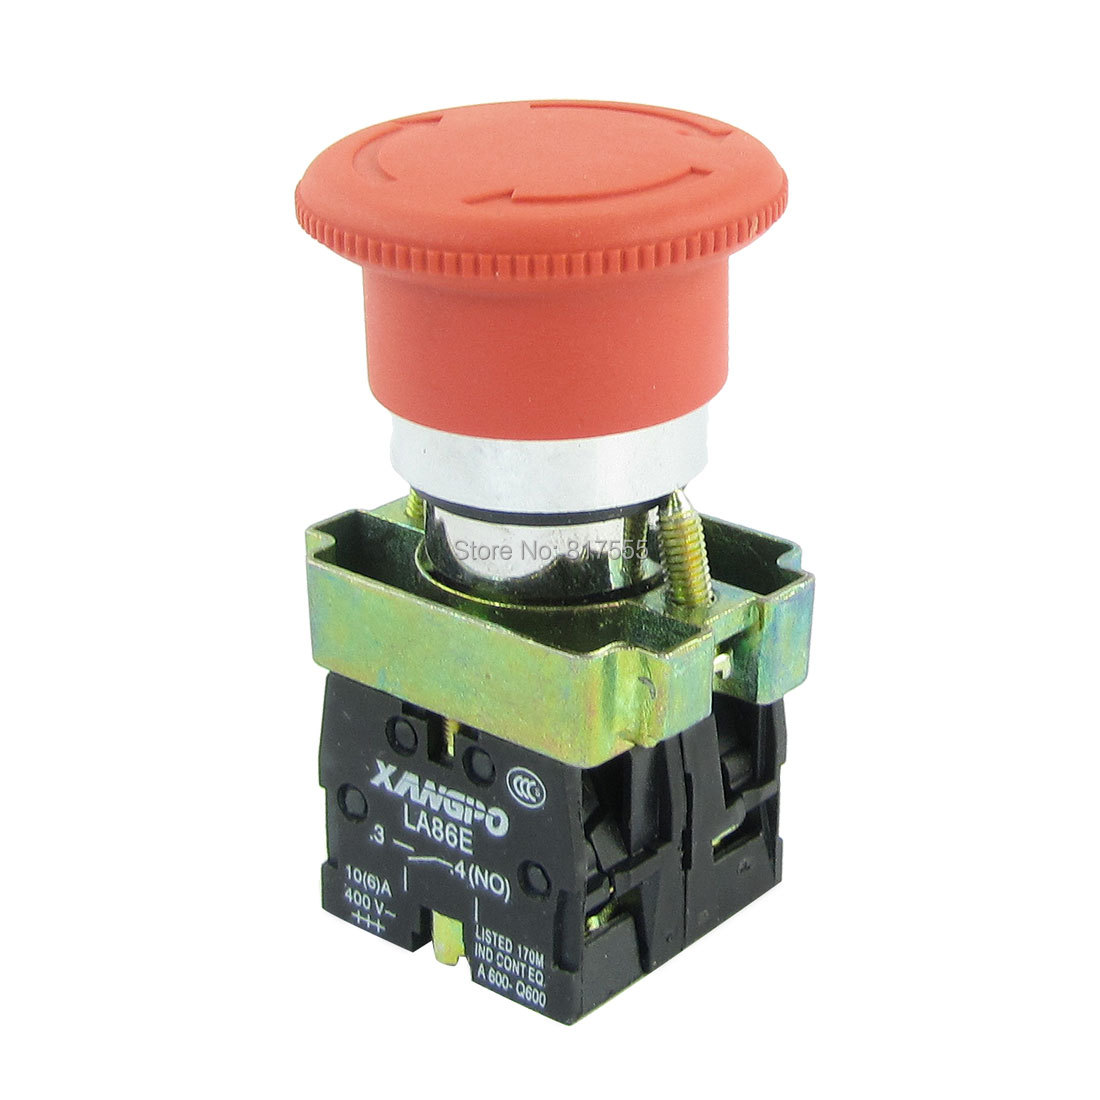 Red Mushroom Head 4-Terminal 1NC+1NO Emergency Push Botton Switch AC 400V 10A